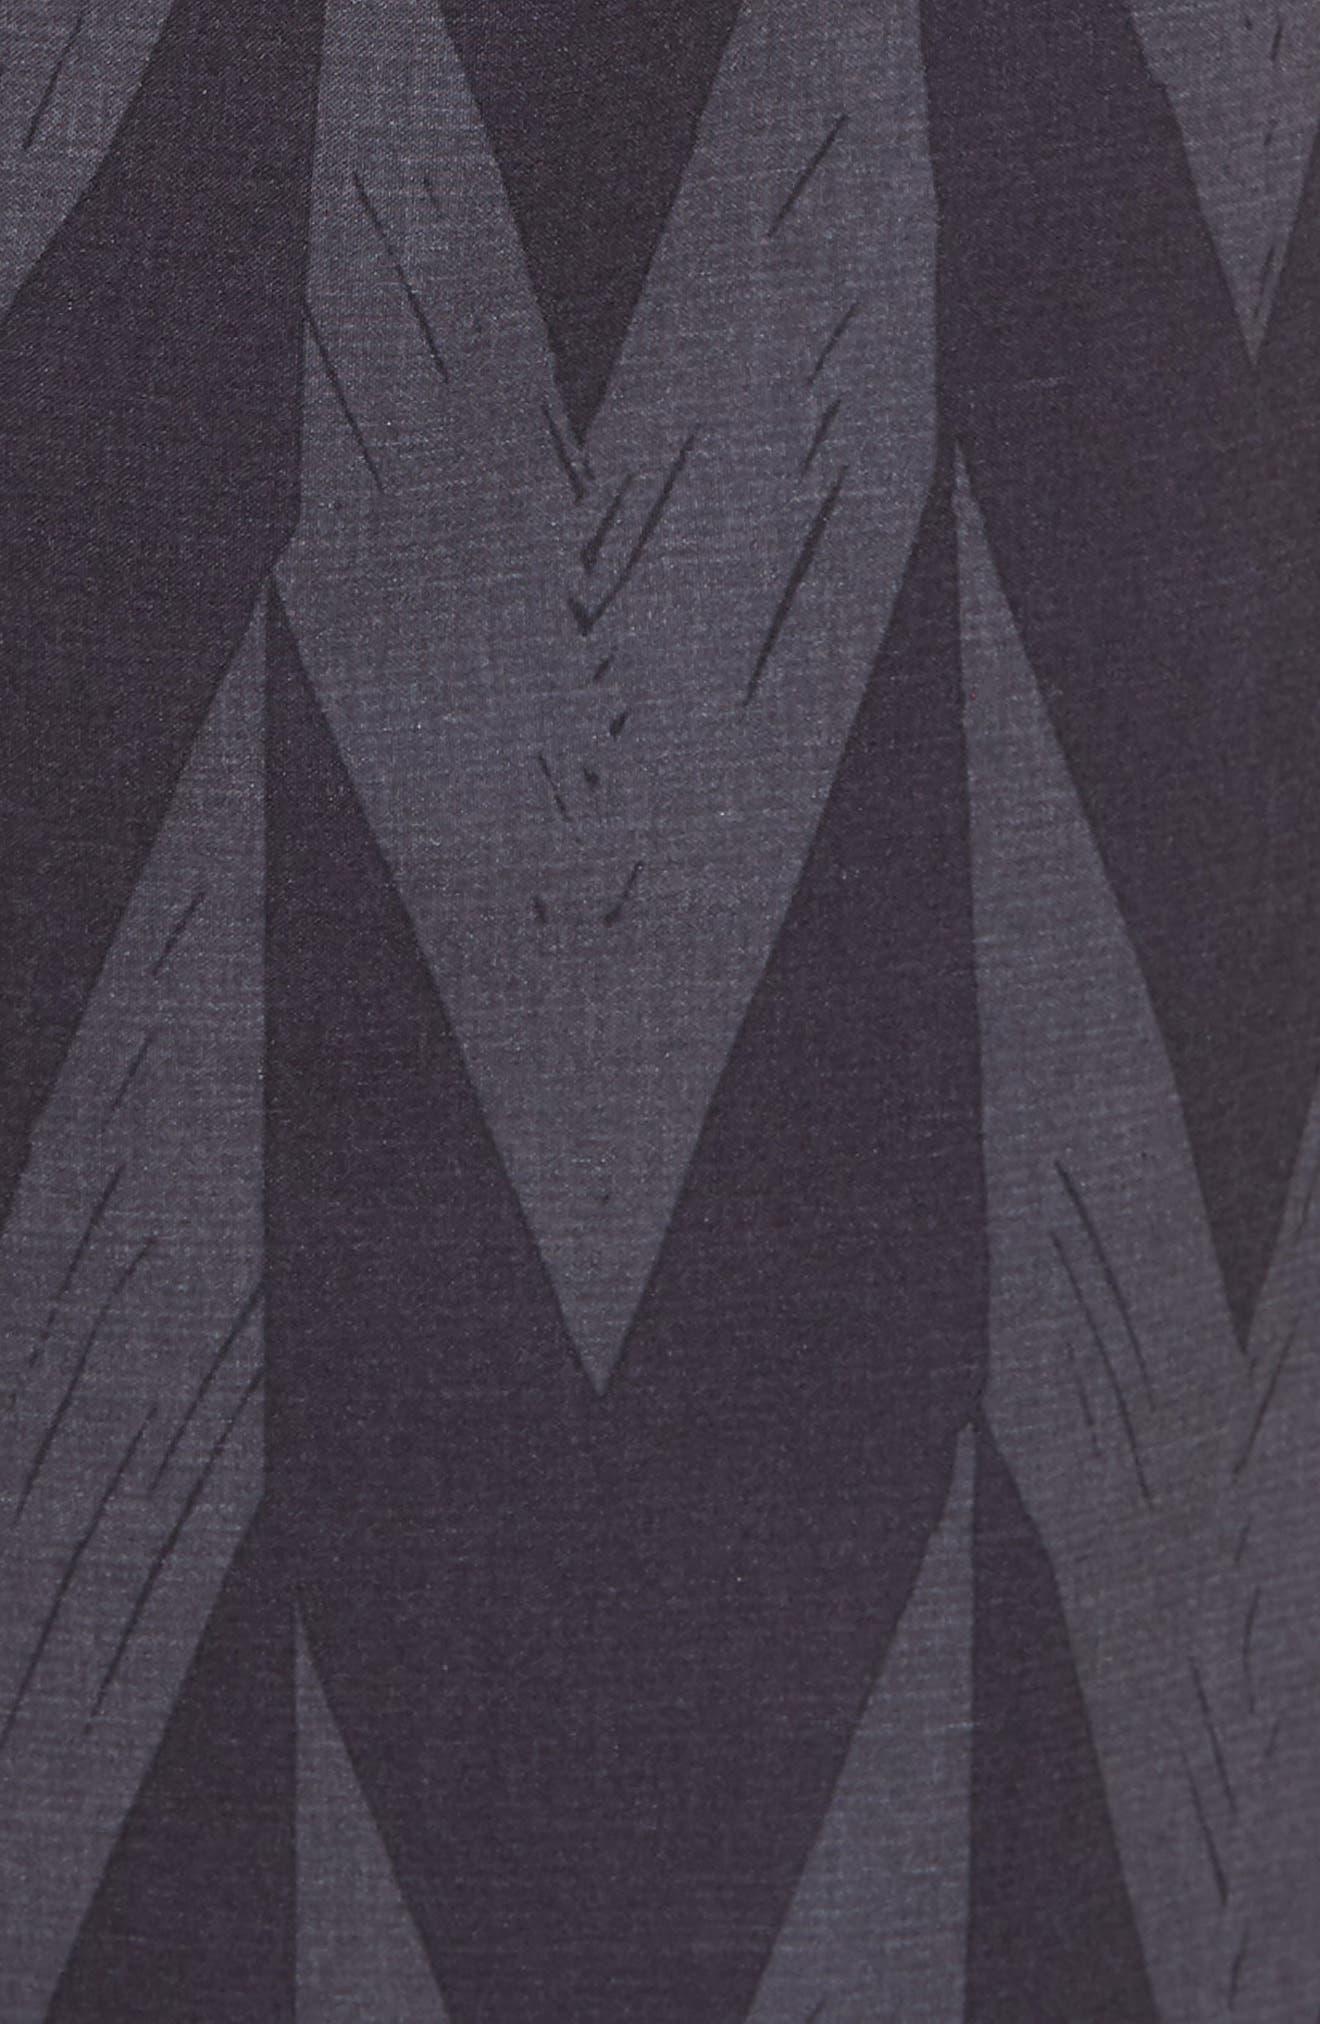 Phantom Bula Board Shorts,                             Alternate thumbnail 5, color,                             Black